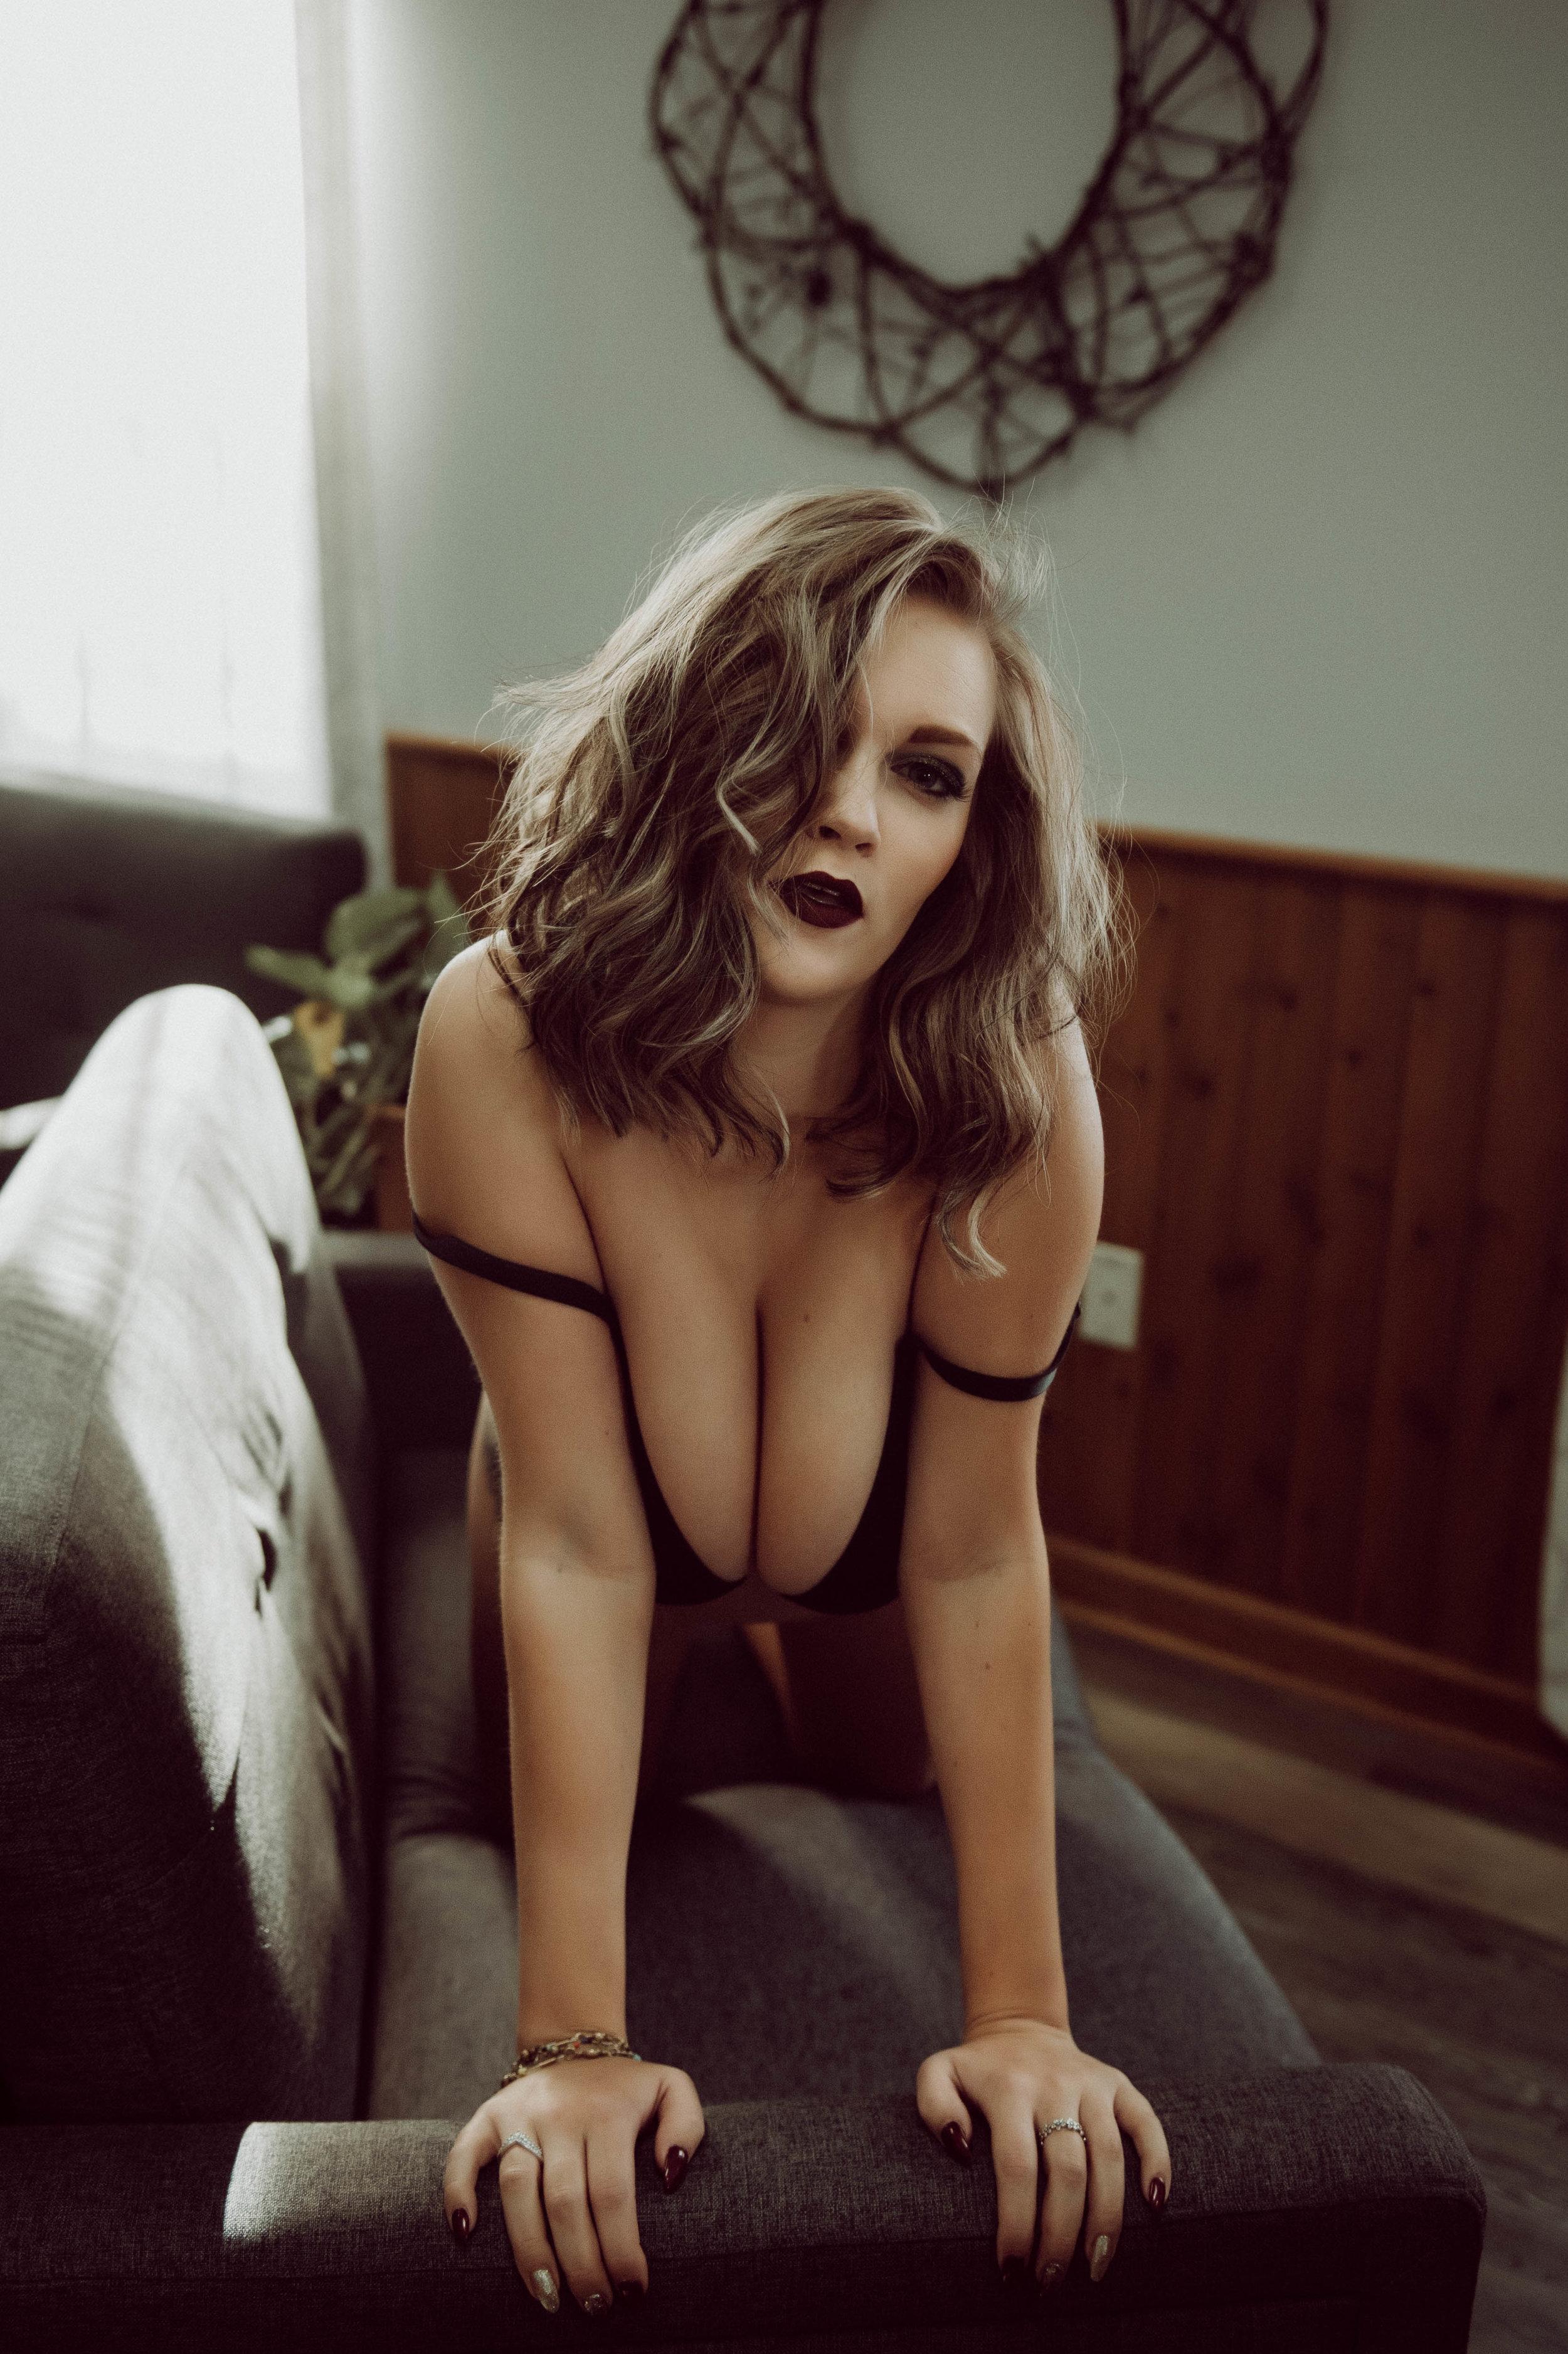 short hair woman kneeling on couch in black bra boudoir photography new york city studio